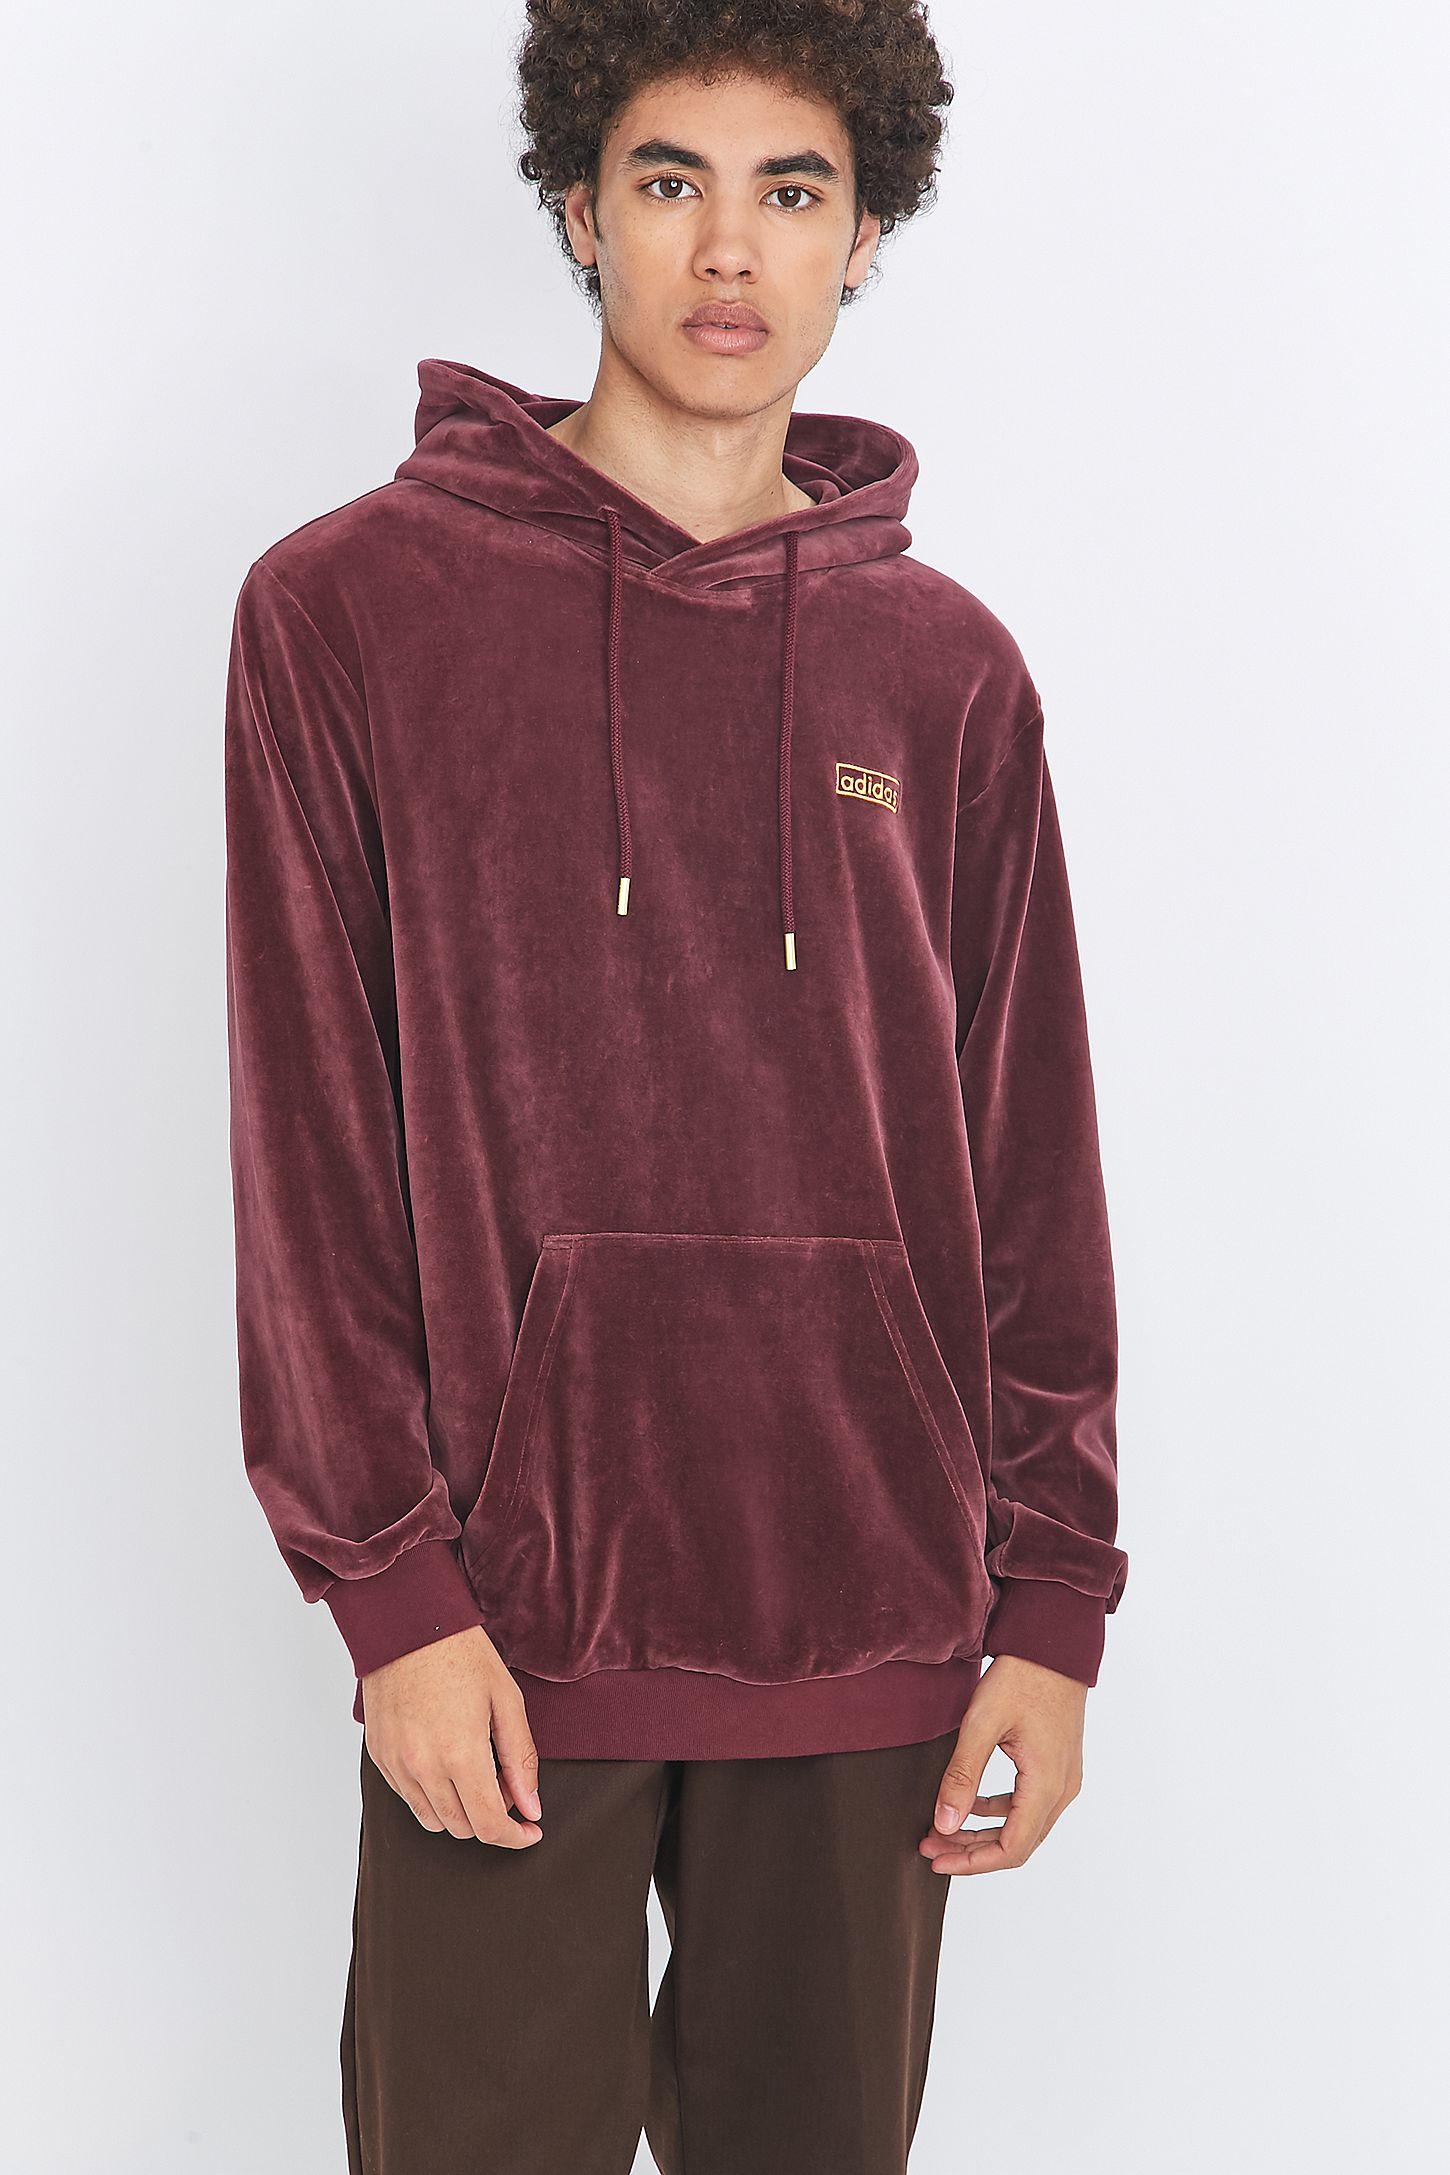 adidas Originals Maroon Velour Pullover Hoodie  41de296fb367